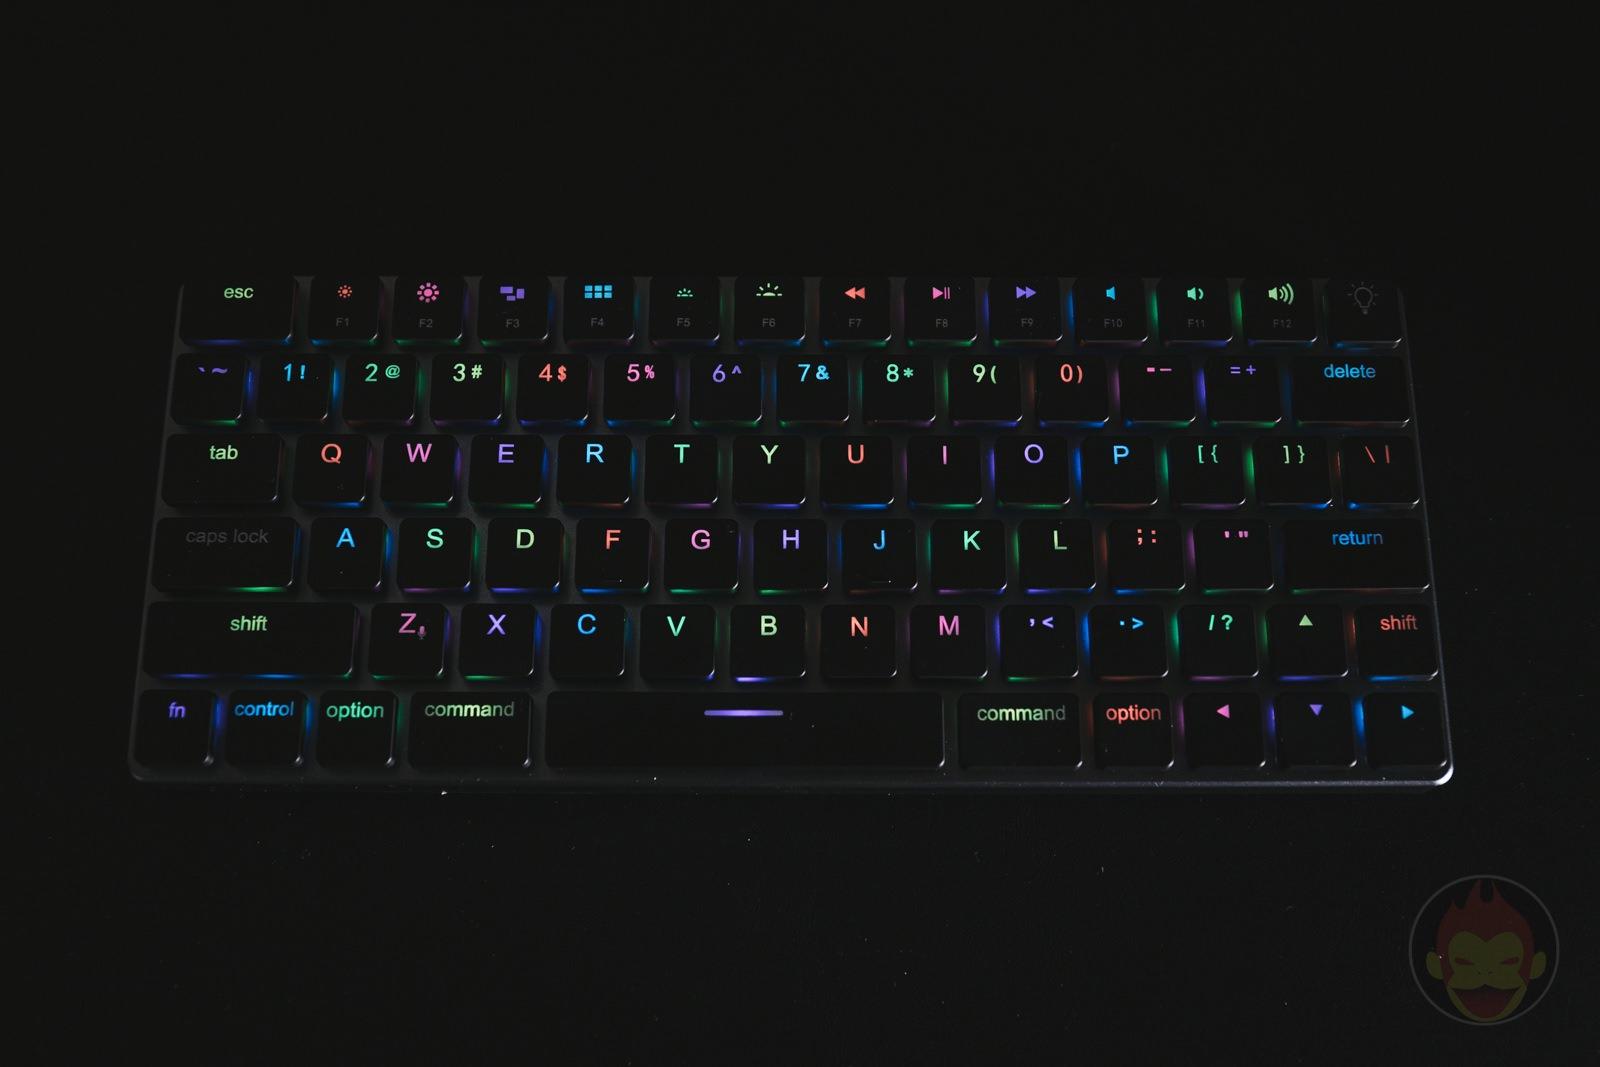 Vinpok-Taptek-Wireless-Keyboard-Review-13.jpg